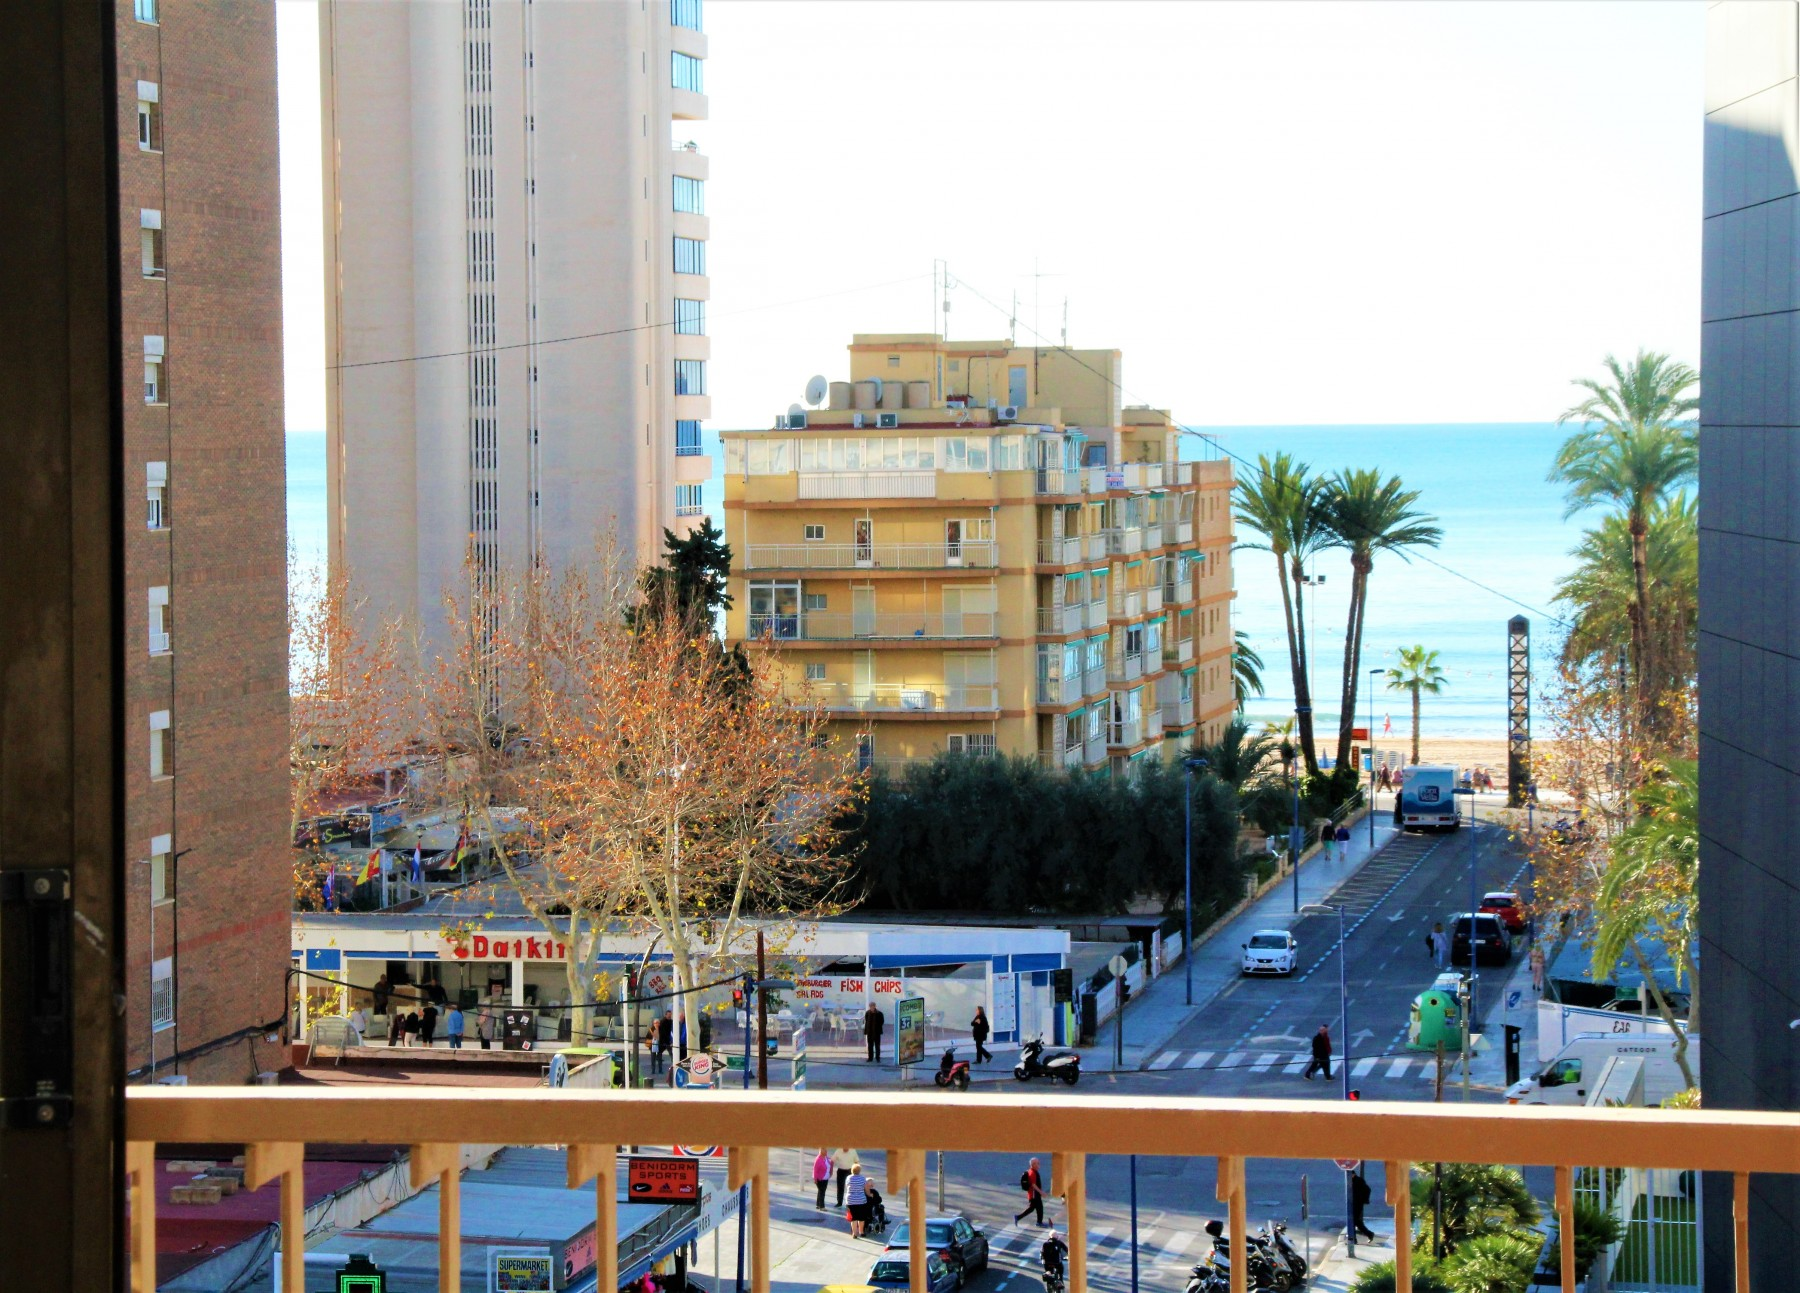 Apartamentos en benidorm payma 6 a - Alquiler de apartamentos en benidorm particulares ...